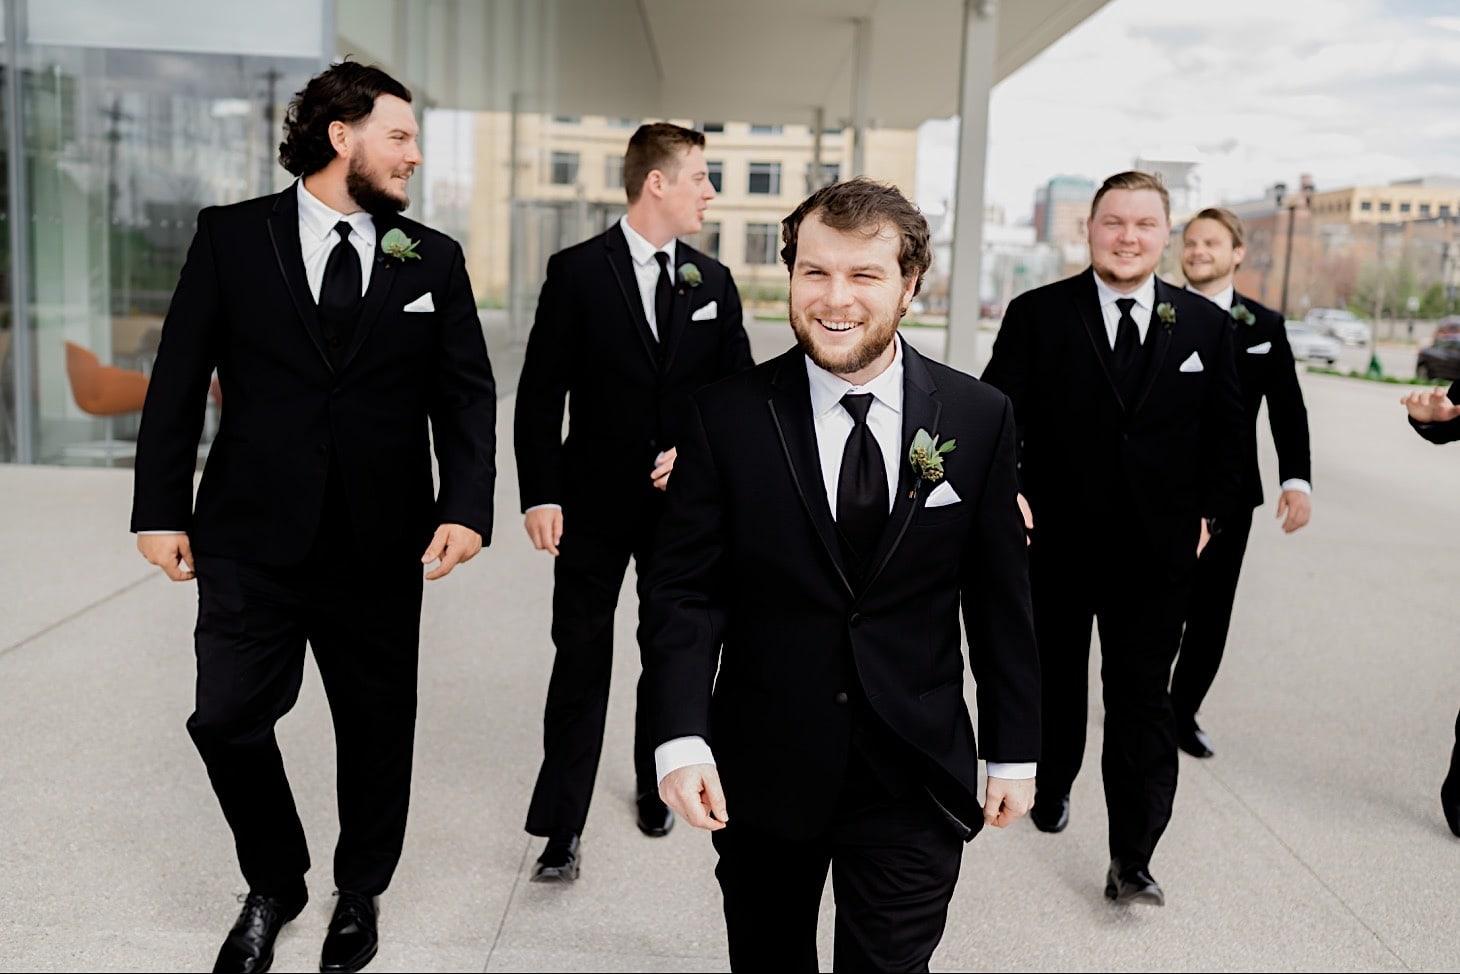 Groomsmen at Des Moines River Center wedding